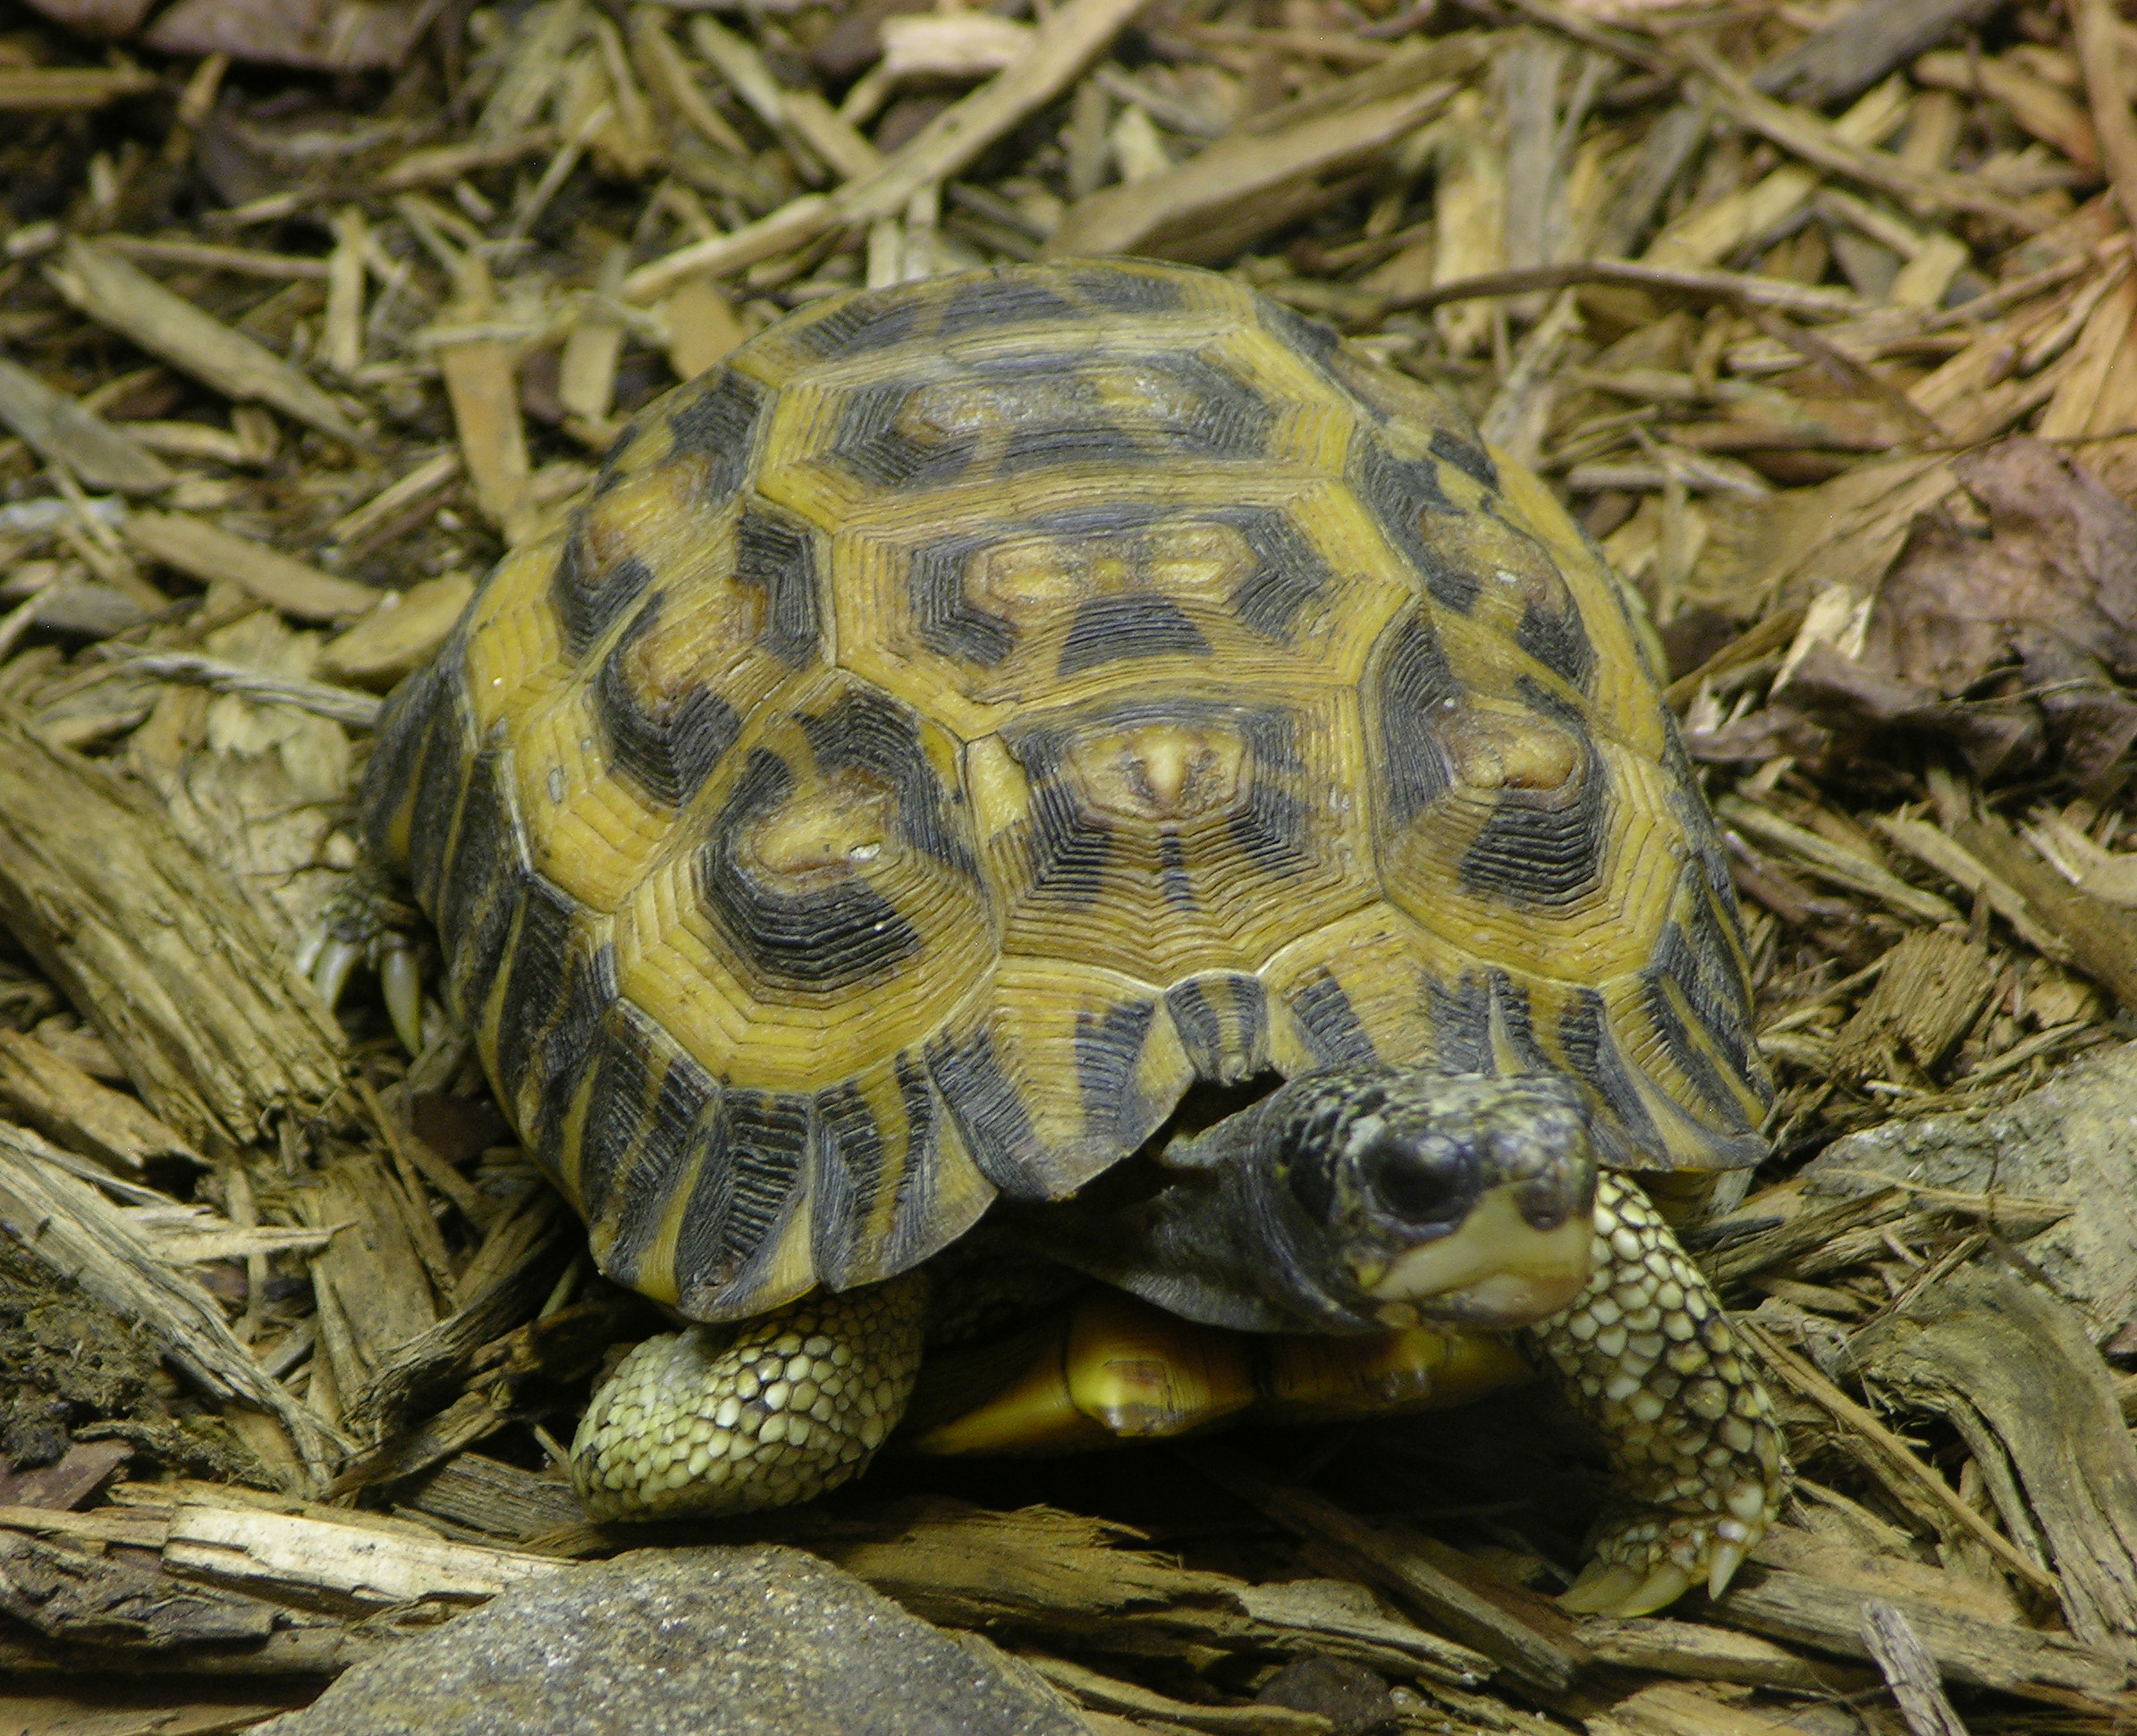 https://upload.wikimedia.org/wikipedia/commons/b/be/Flat-tailed_Tortoise_Pyxis_planicanda_2390px.jpg